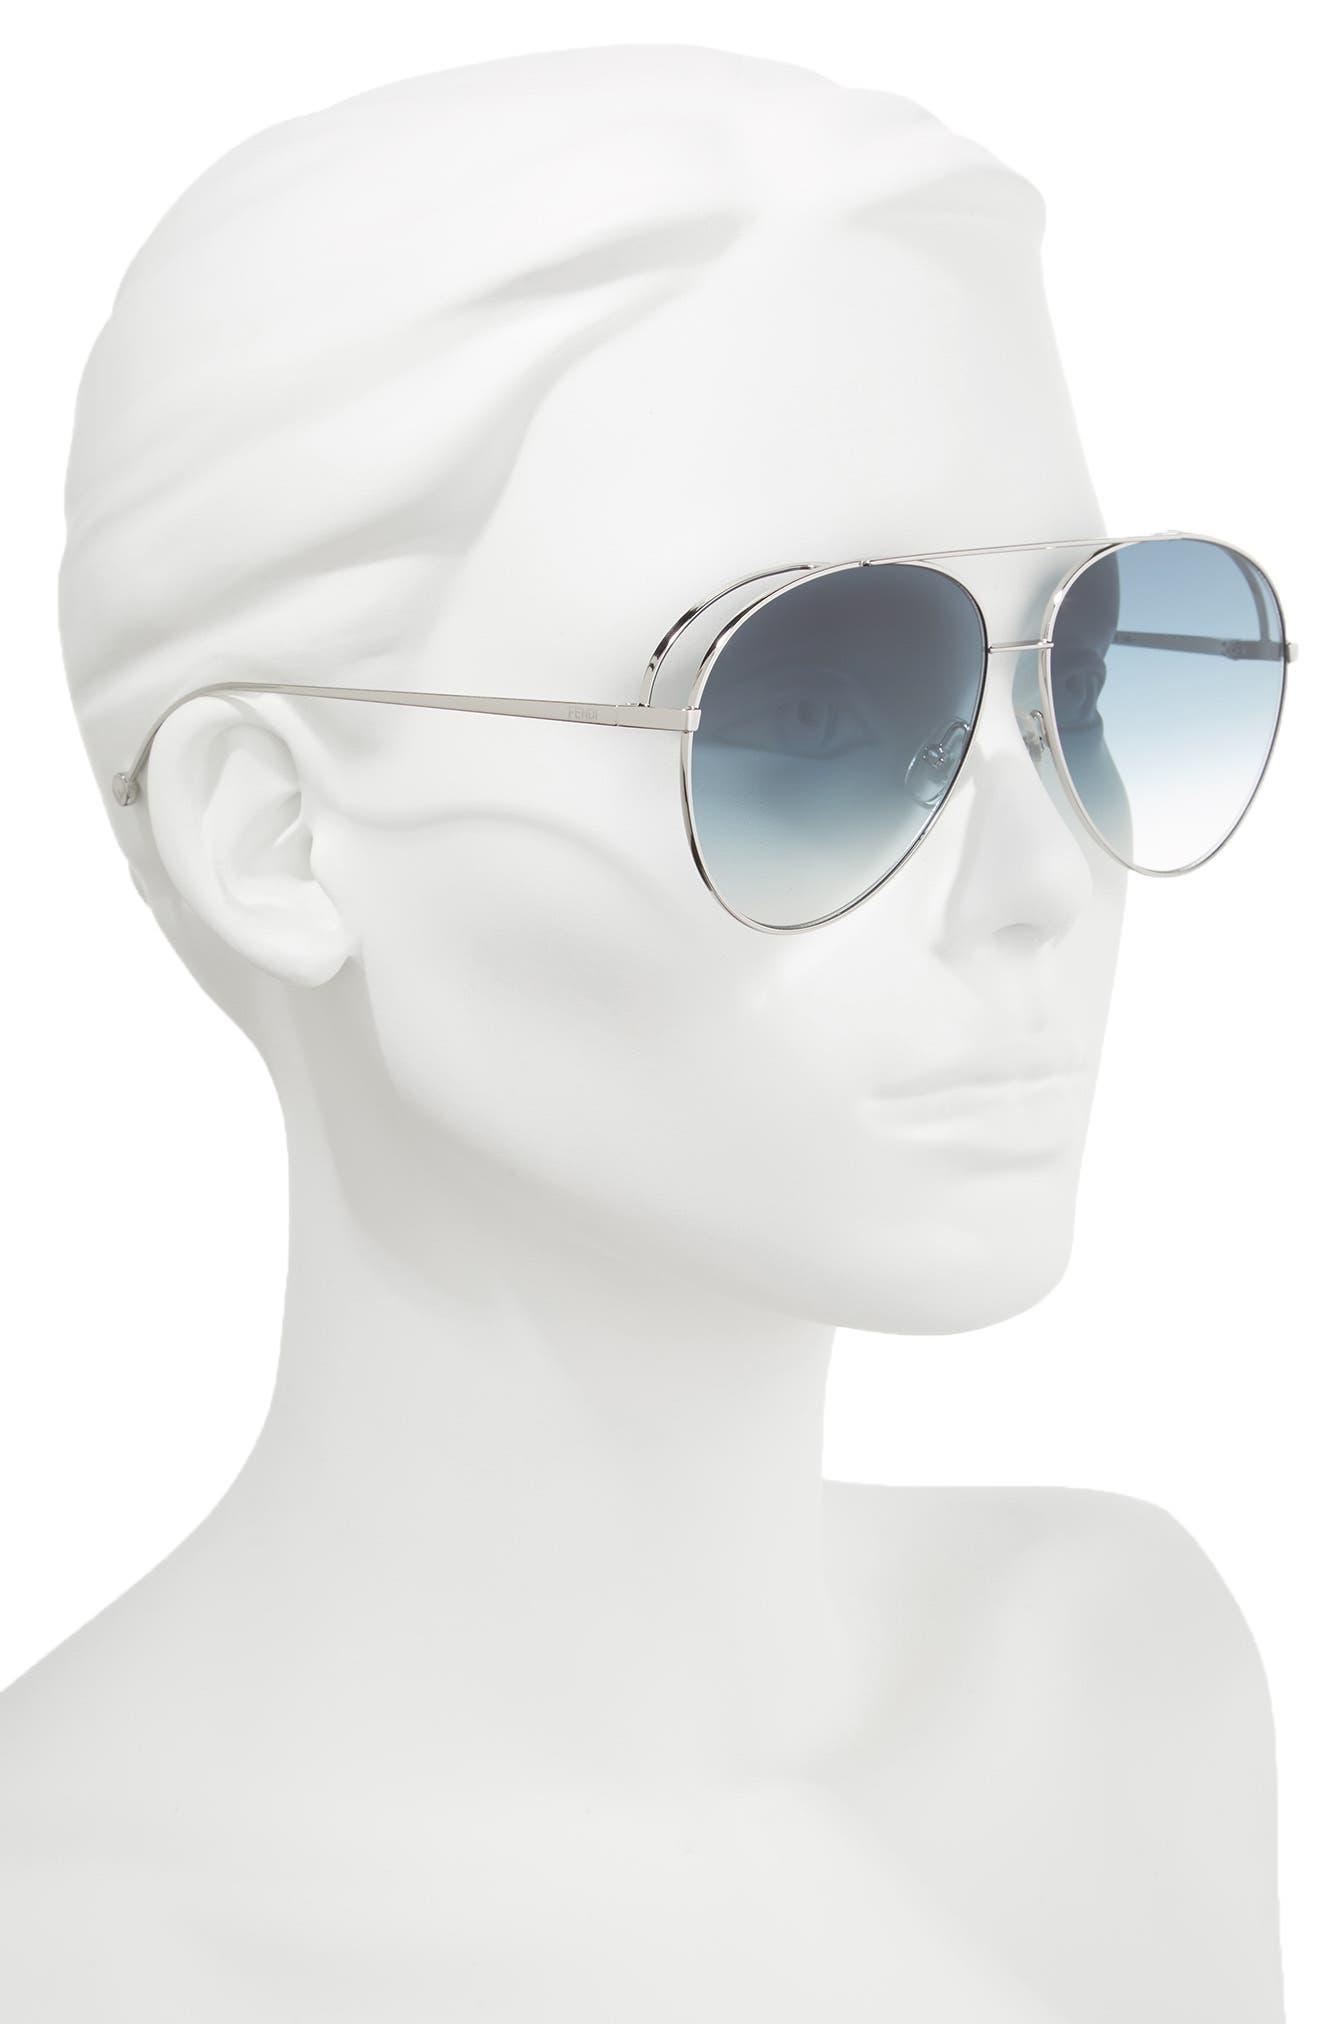 52mm Aviator Sunglasses,                             Alternate thumbnail 2, color,                             PALLADIUM